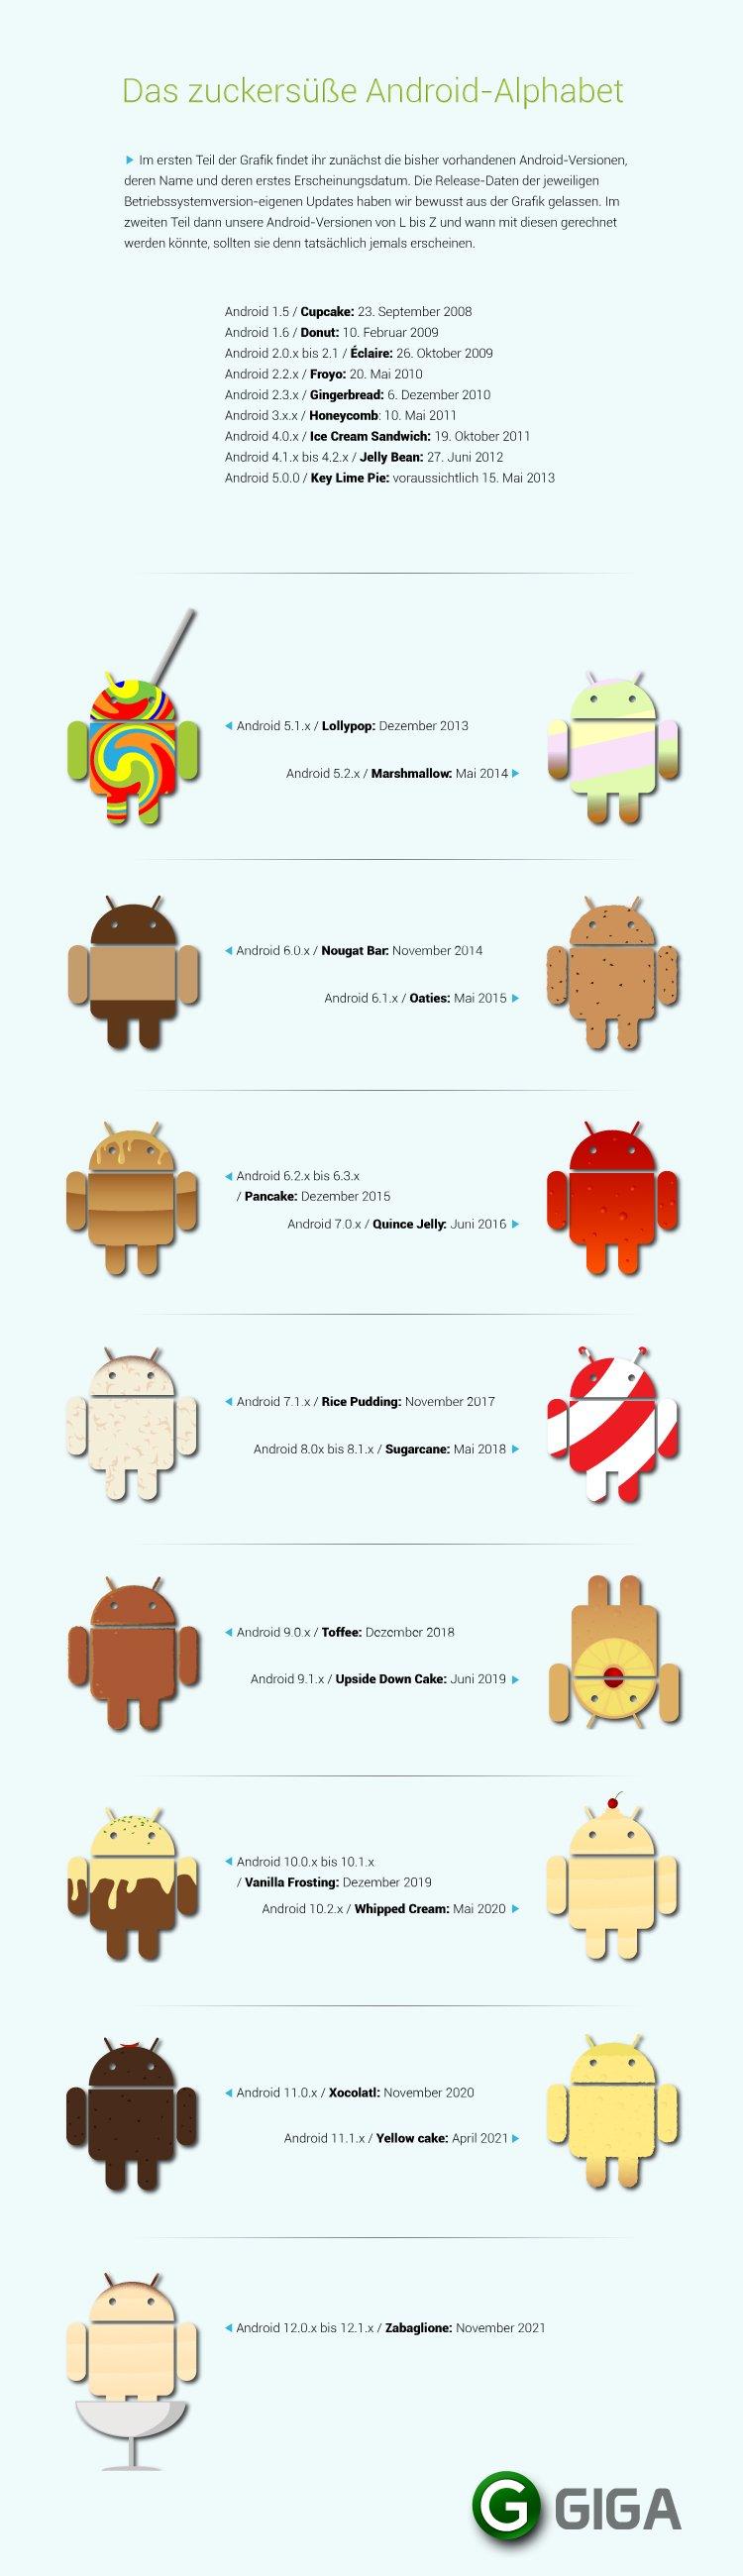 GIGA-future-android-versions